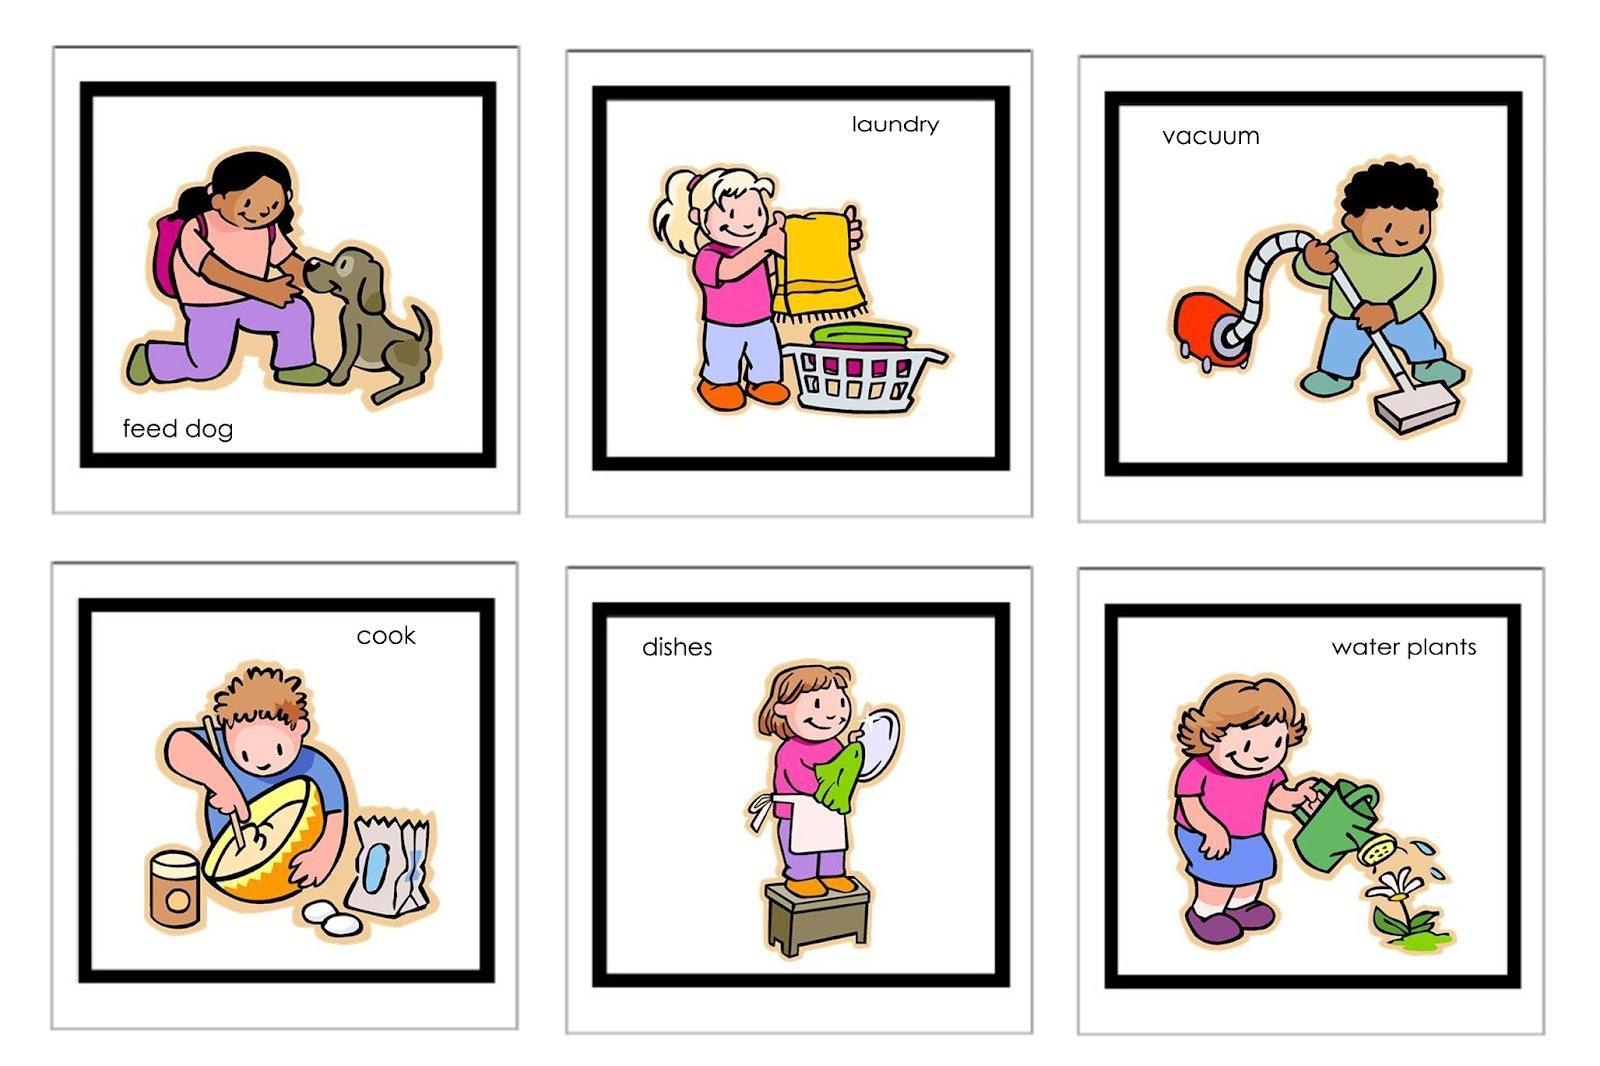 Chore Clipart Household Chore Chore Household Chore